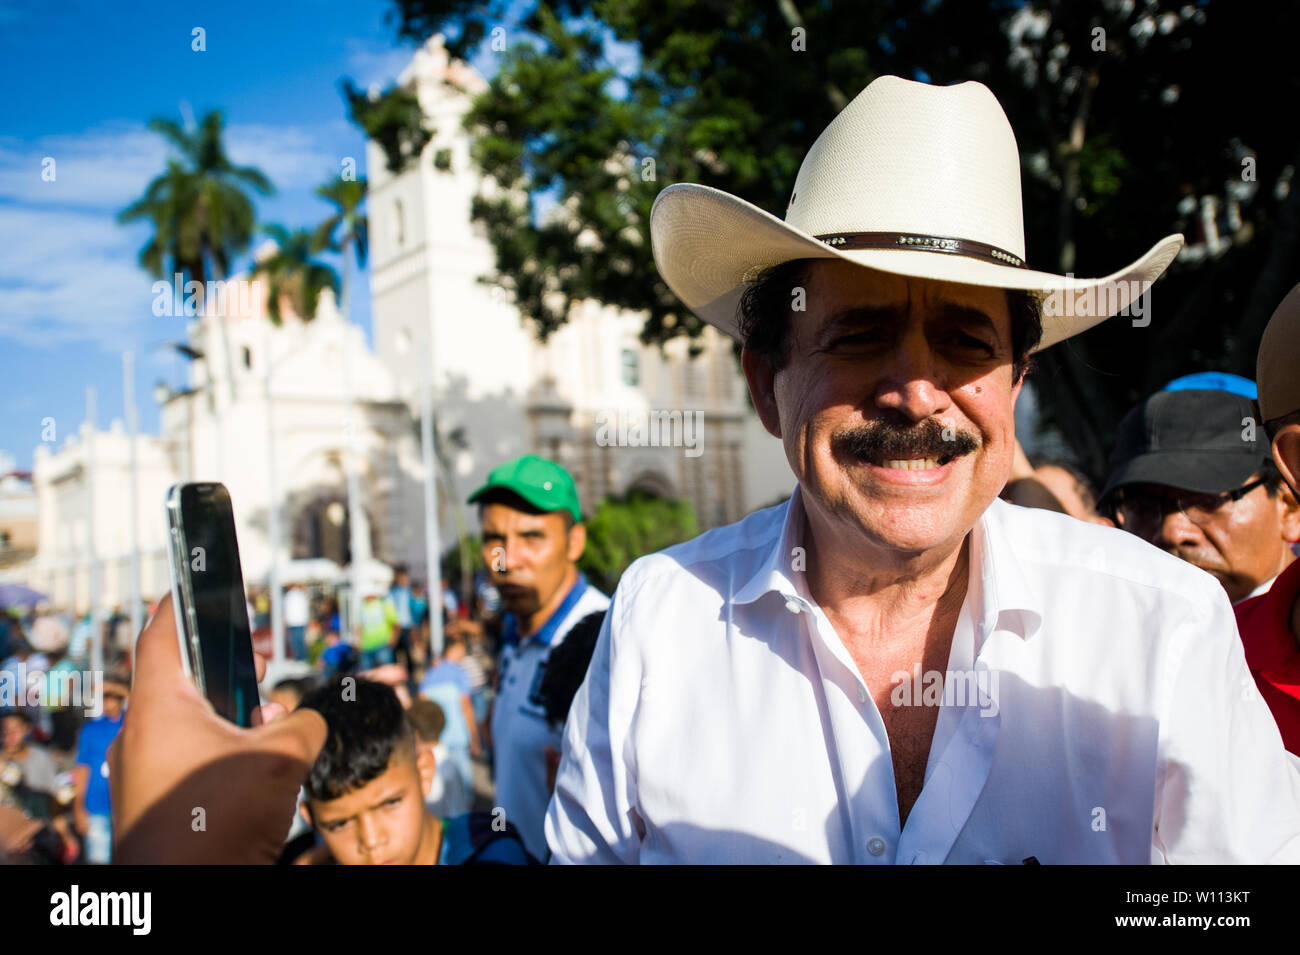 Tegucigalpa, Honduras. 29 Juni, 2019. Forme Honduras Präsident Manuel Zelaya nimmt Teil an einem Konzert zum 10 Jahr Jubiläum Putsch Credit: Camilo Freedman/ZUMA Draht/Alamy Leben Nachrichten gedenken Stockfoto